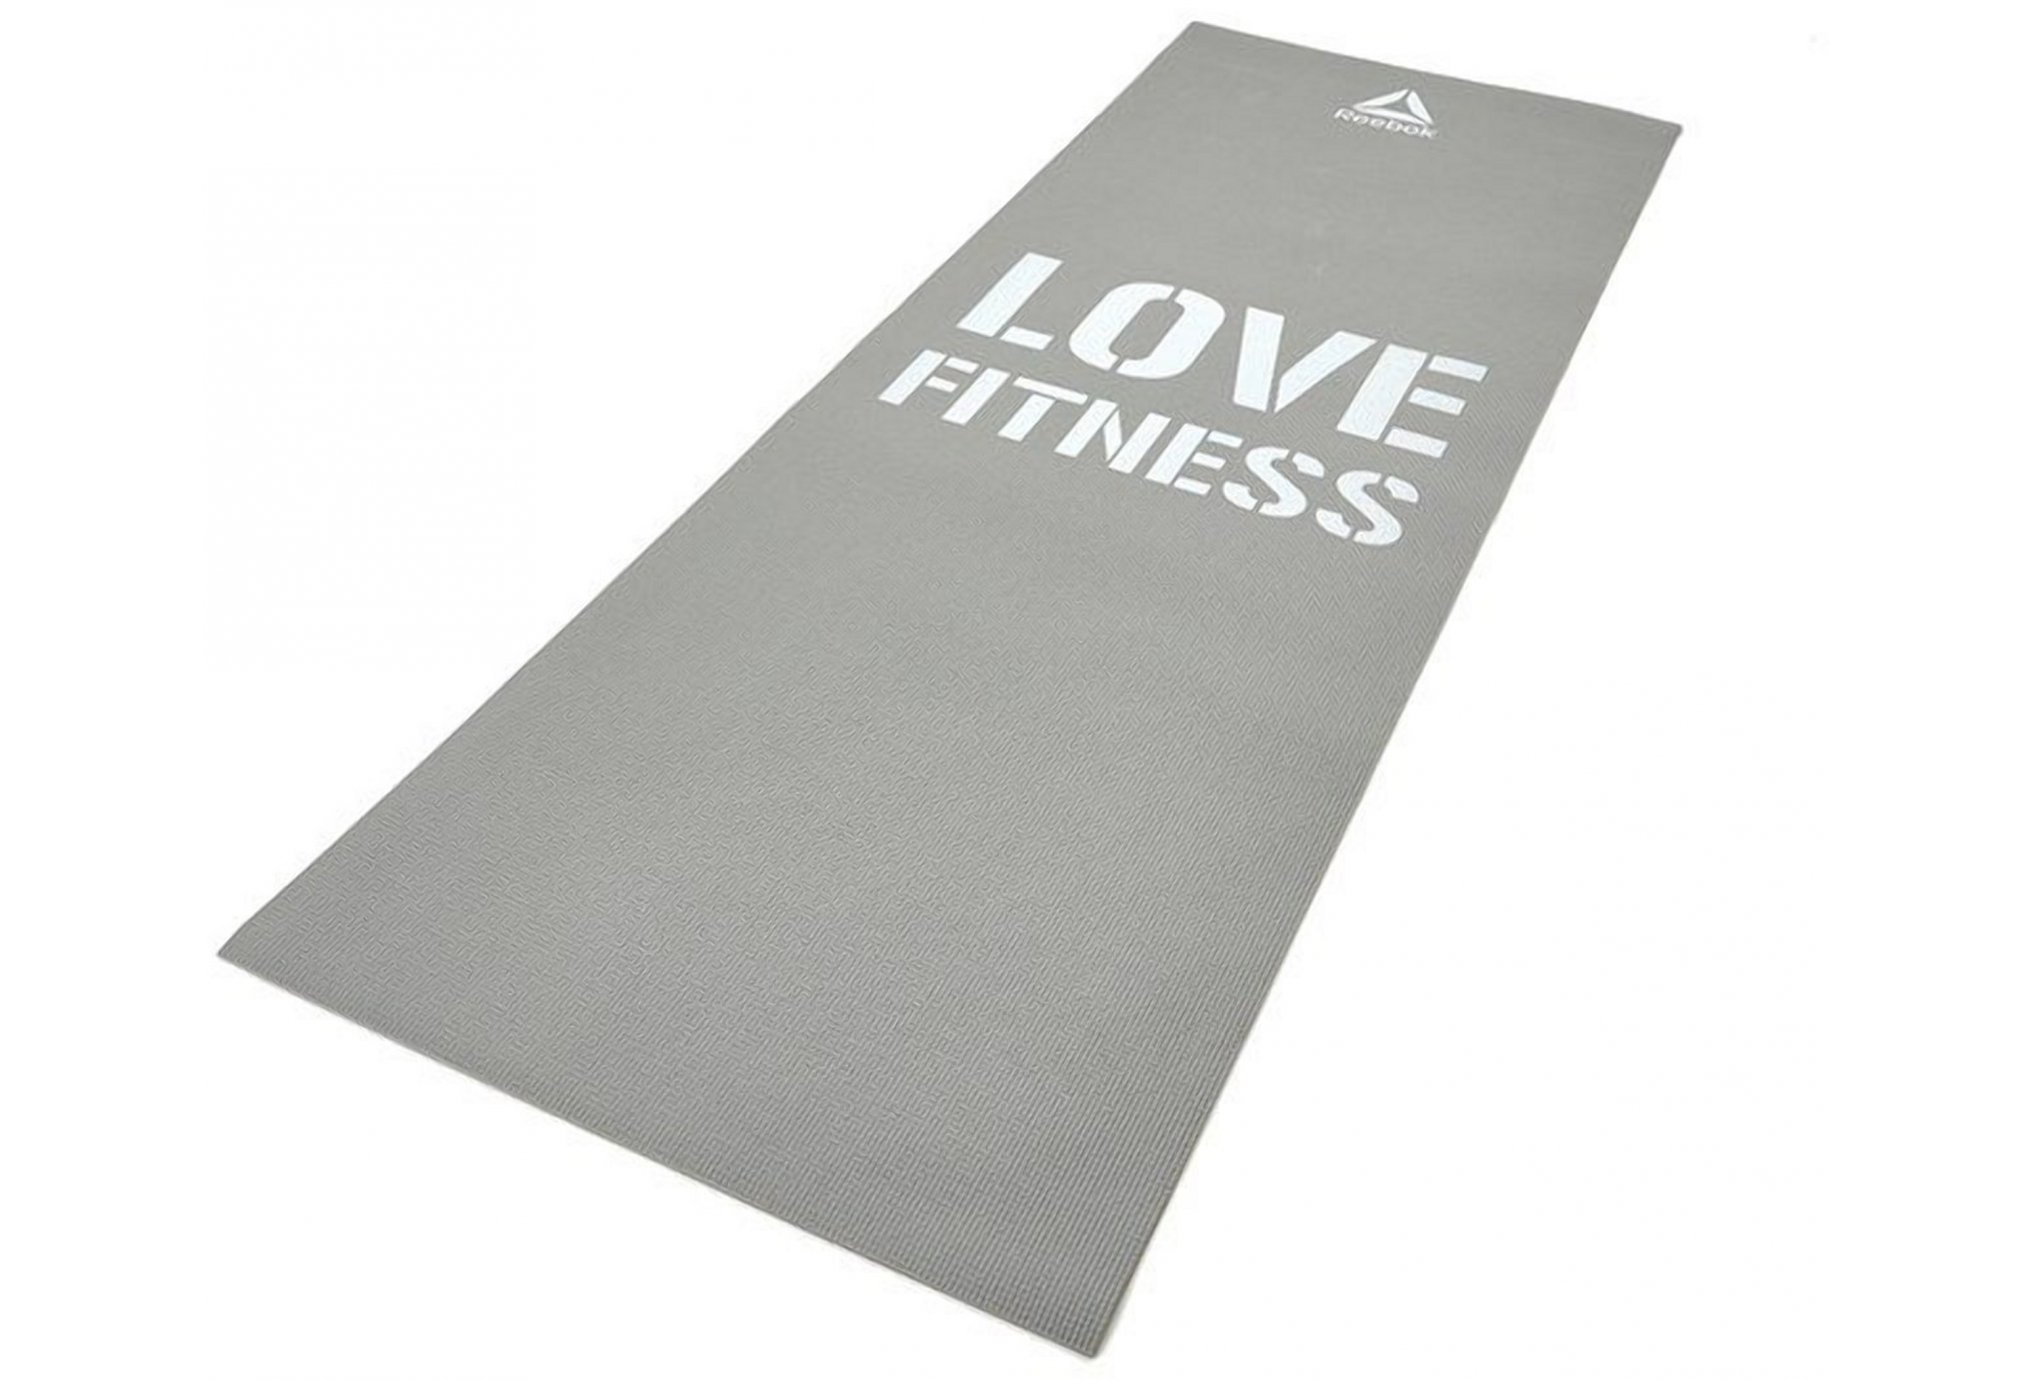 Reebok Fitness Mat Training